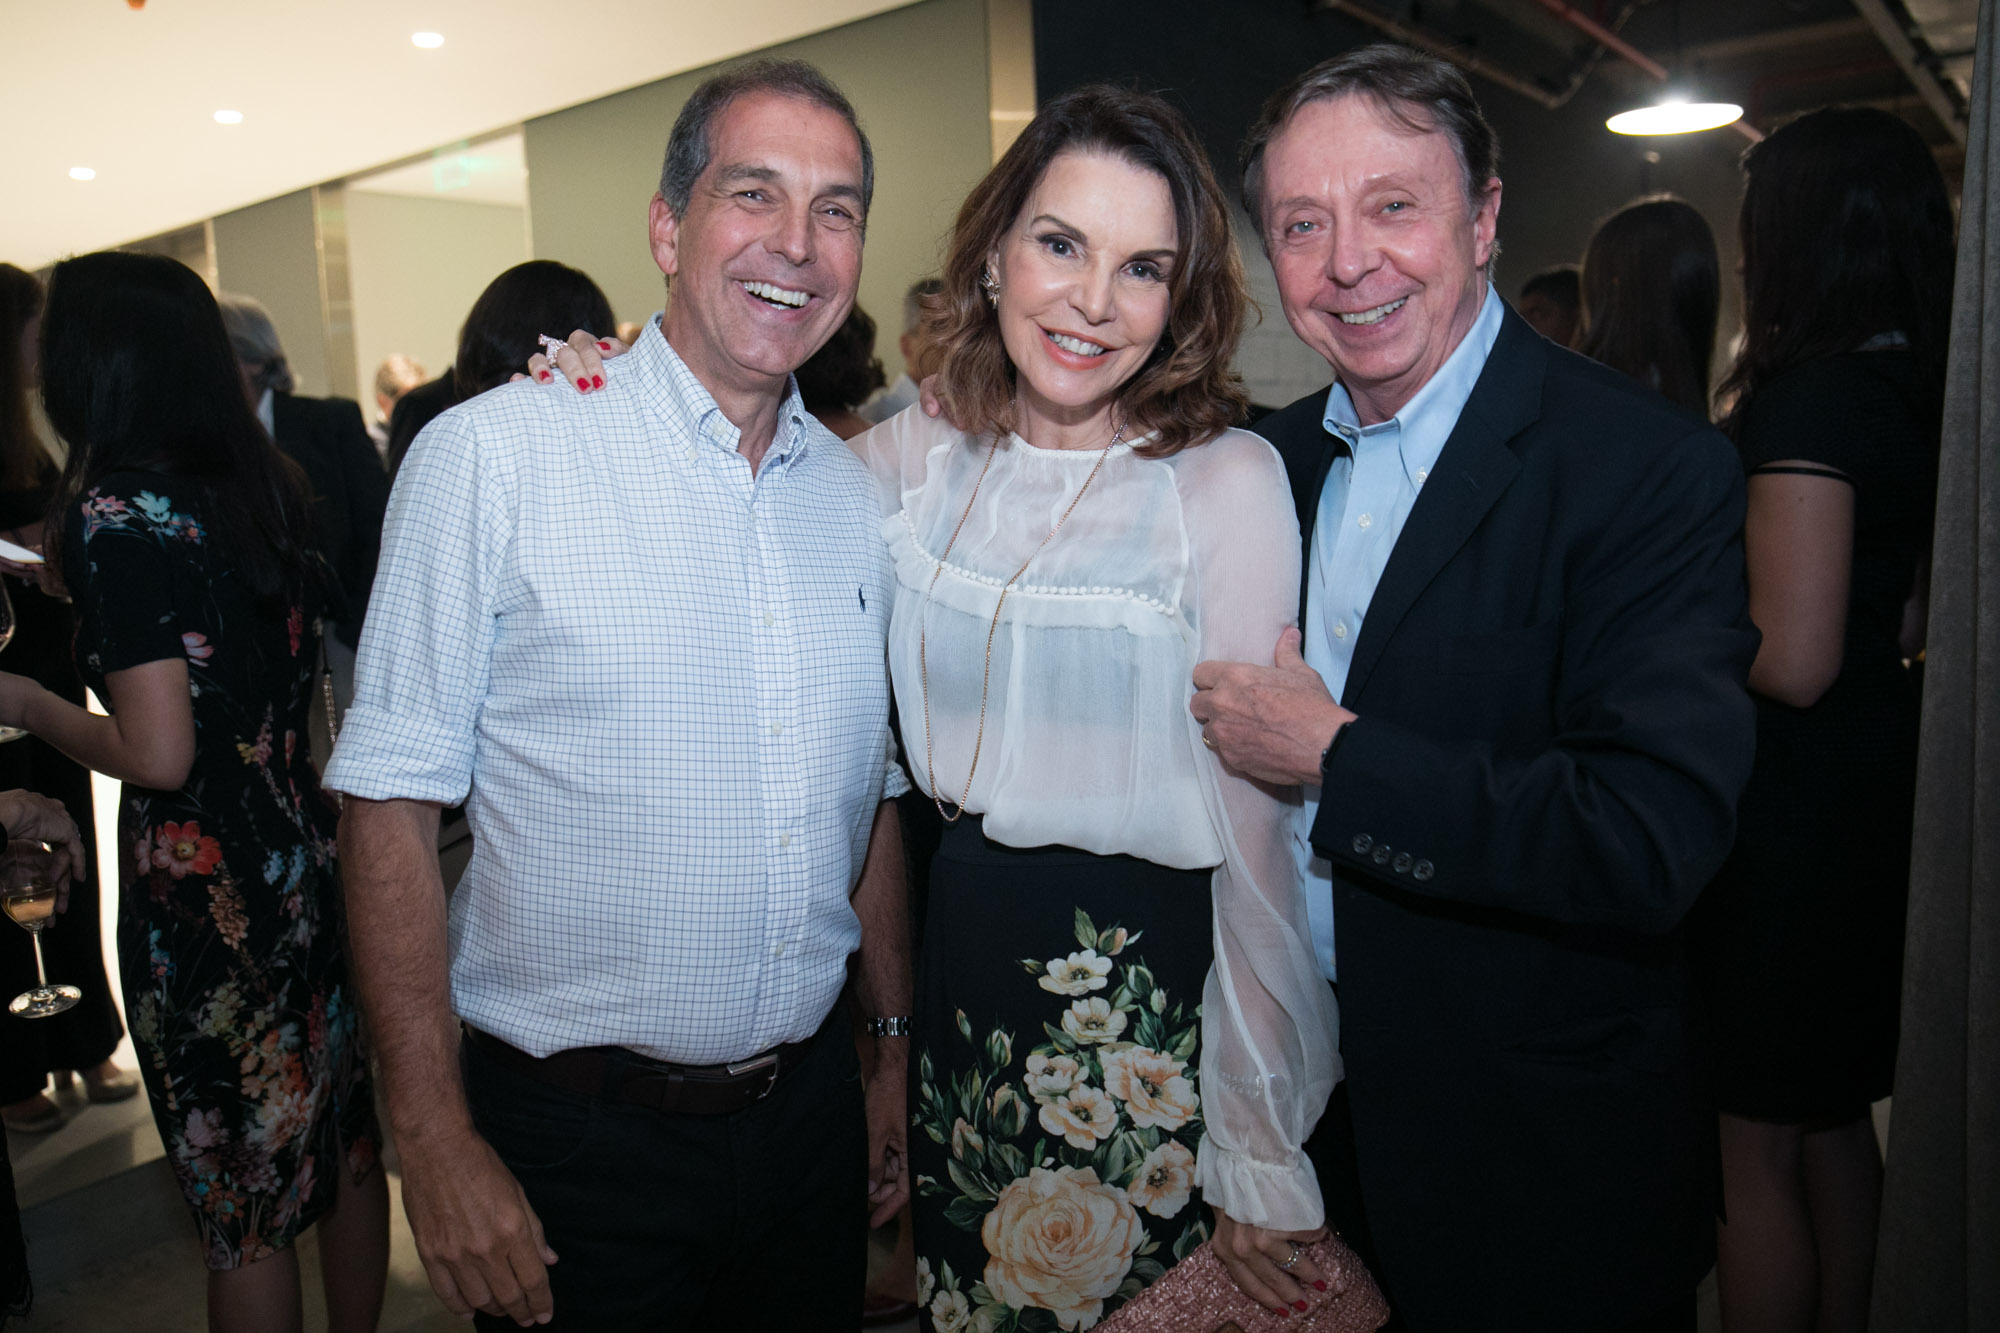 _Luiz Carlos nabuco, Patricia Mayer e Beto Grabowsky__T2A4749